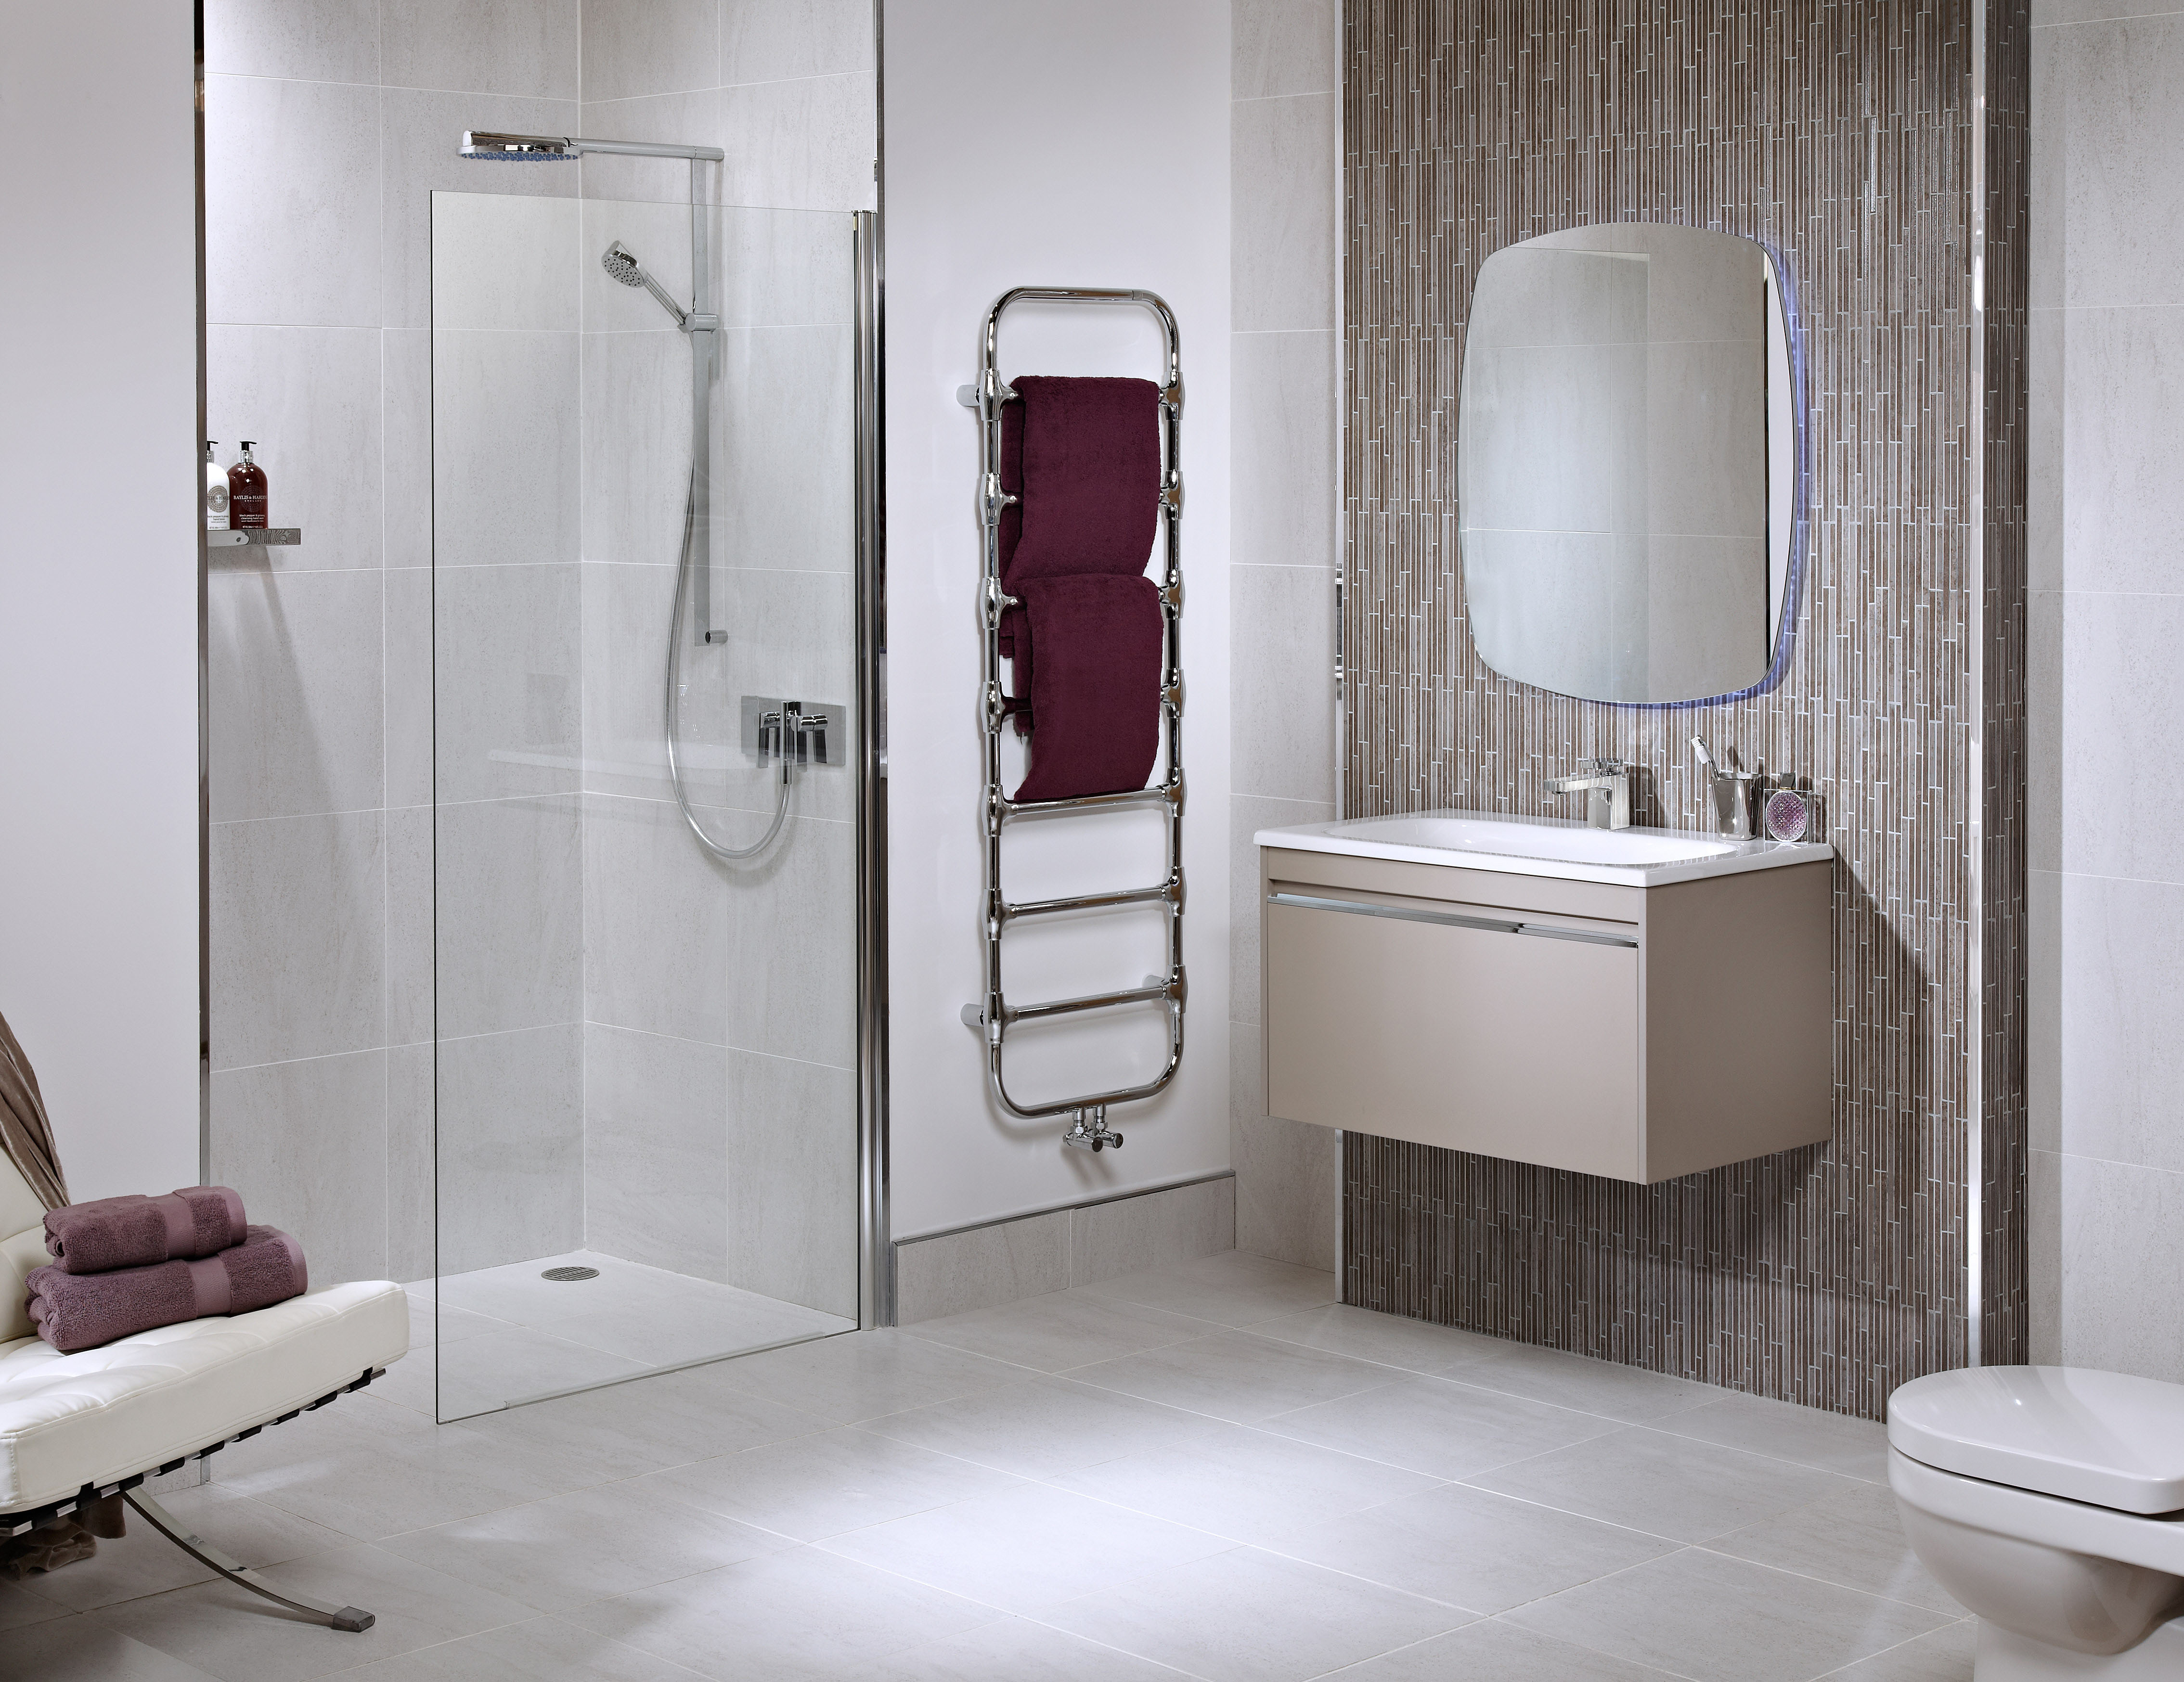 fresh modern bathroom design image-Fascinating Modern Bathroom Design Image